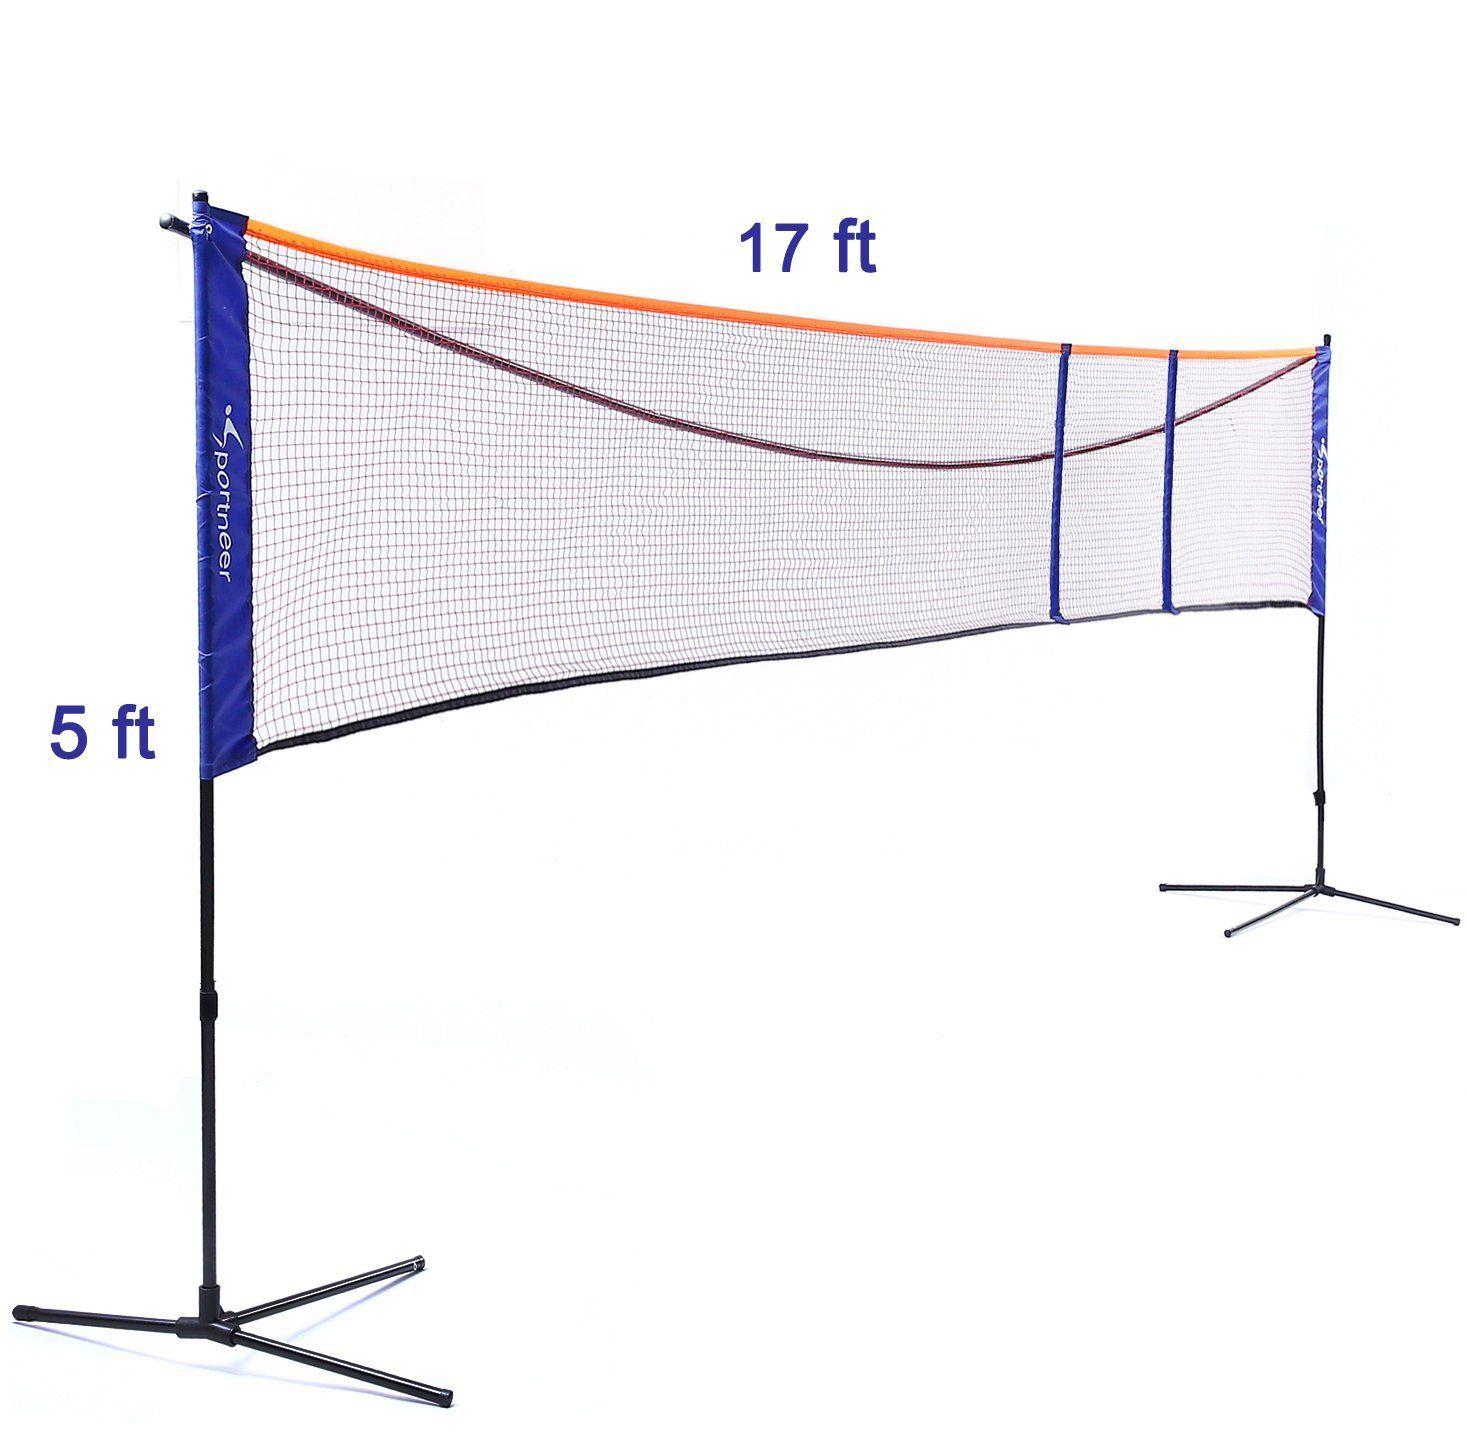 8 Sportneer Badminton Net Stand Set Badminton Nets Soccer Tennis Badminton